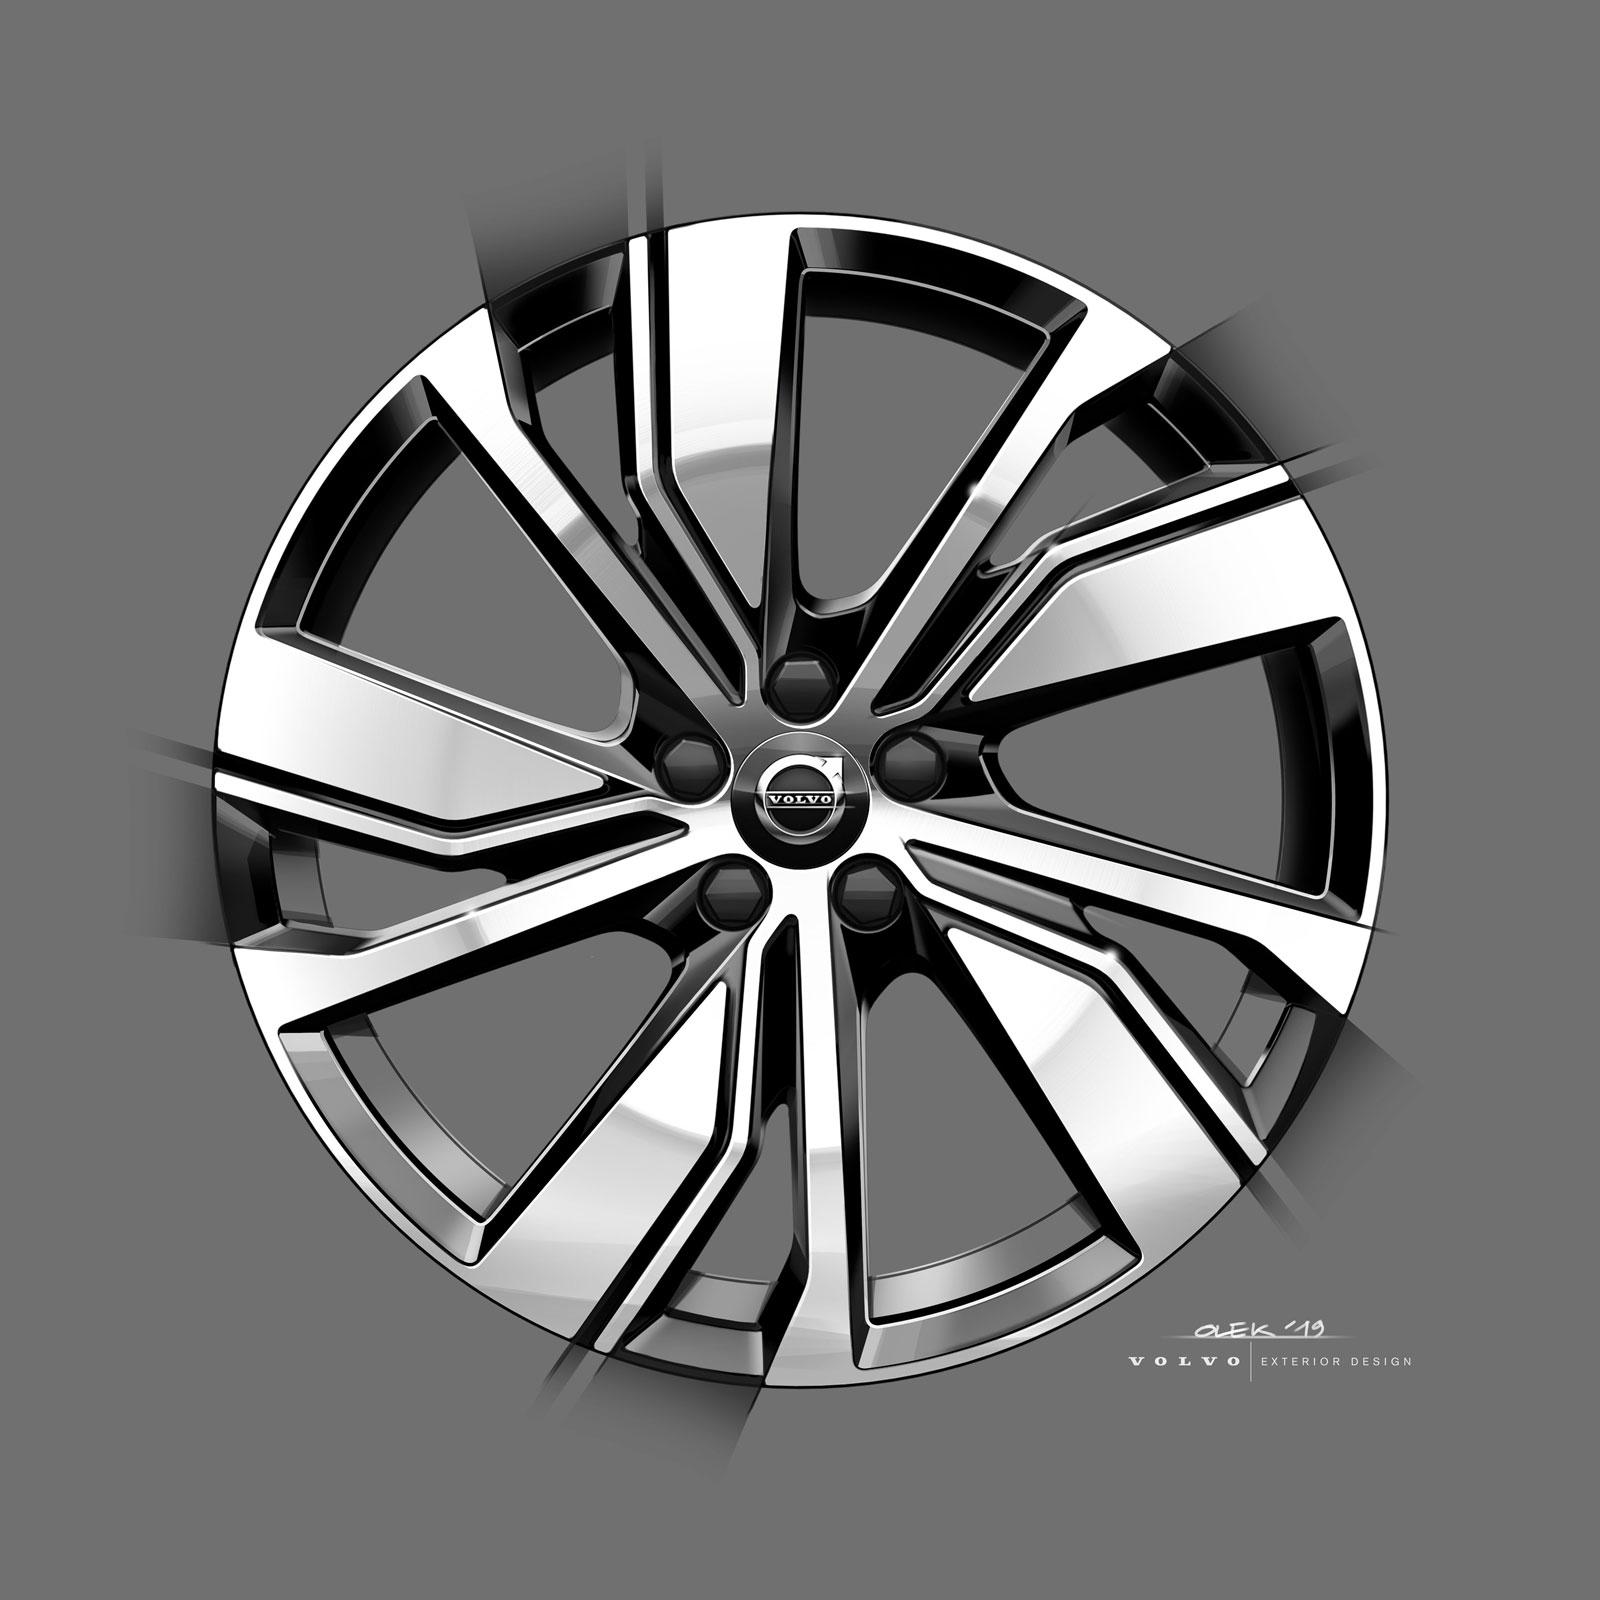 Electric Truck Steps >> Volvo fully electric XC40 Wheel Design Sketch - Car Body ...